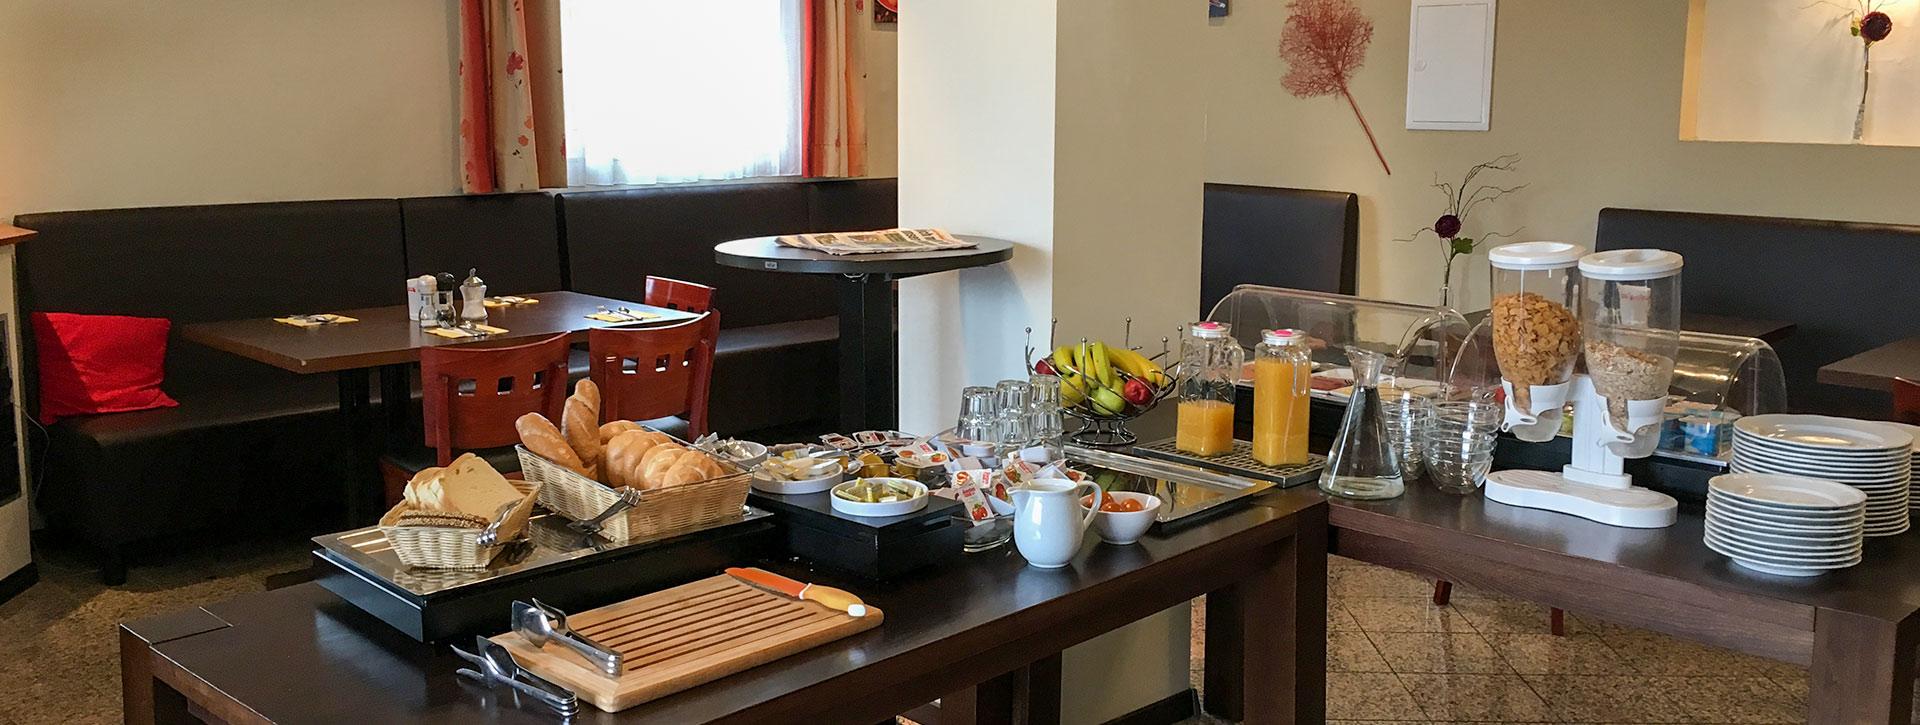 HOTEL • BED & BREAKFAST DENK - Frühstück